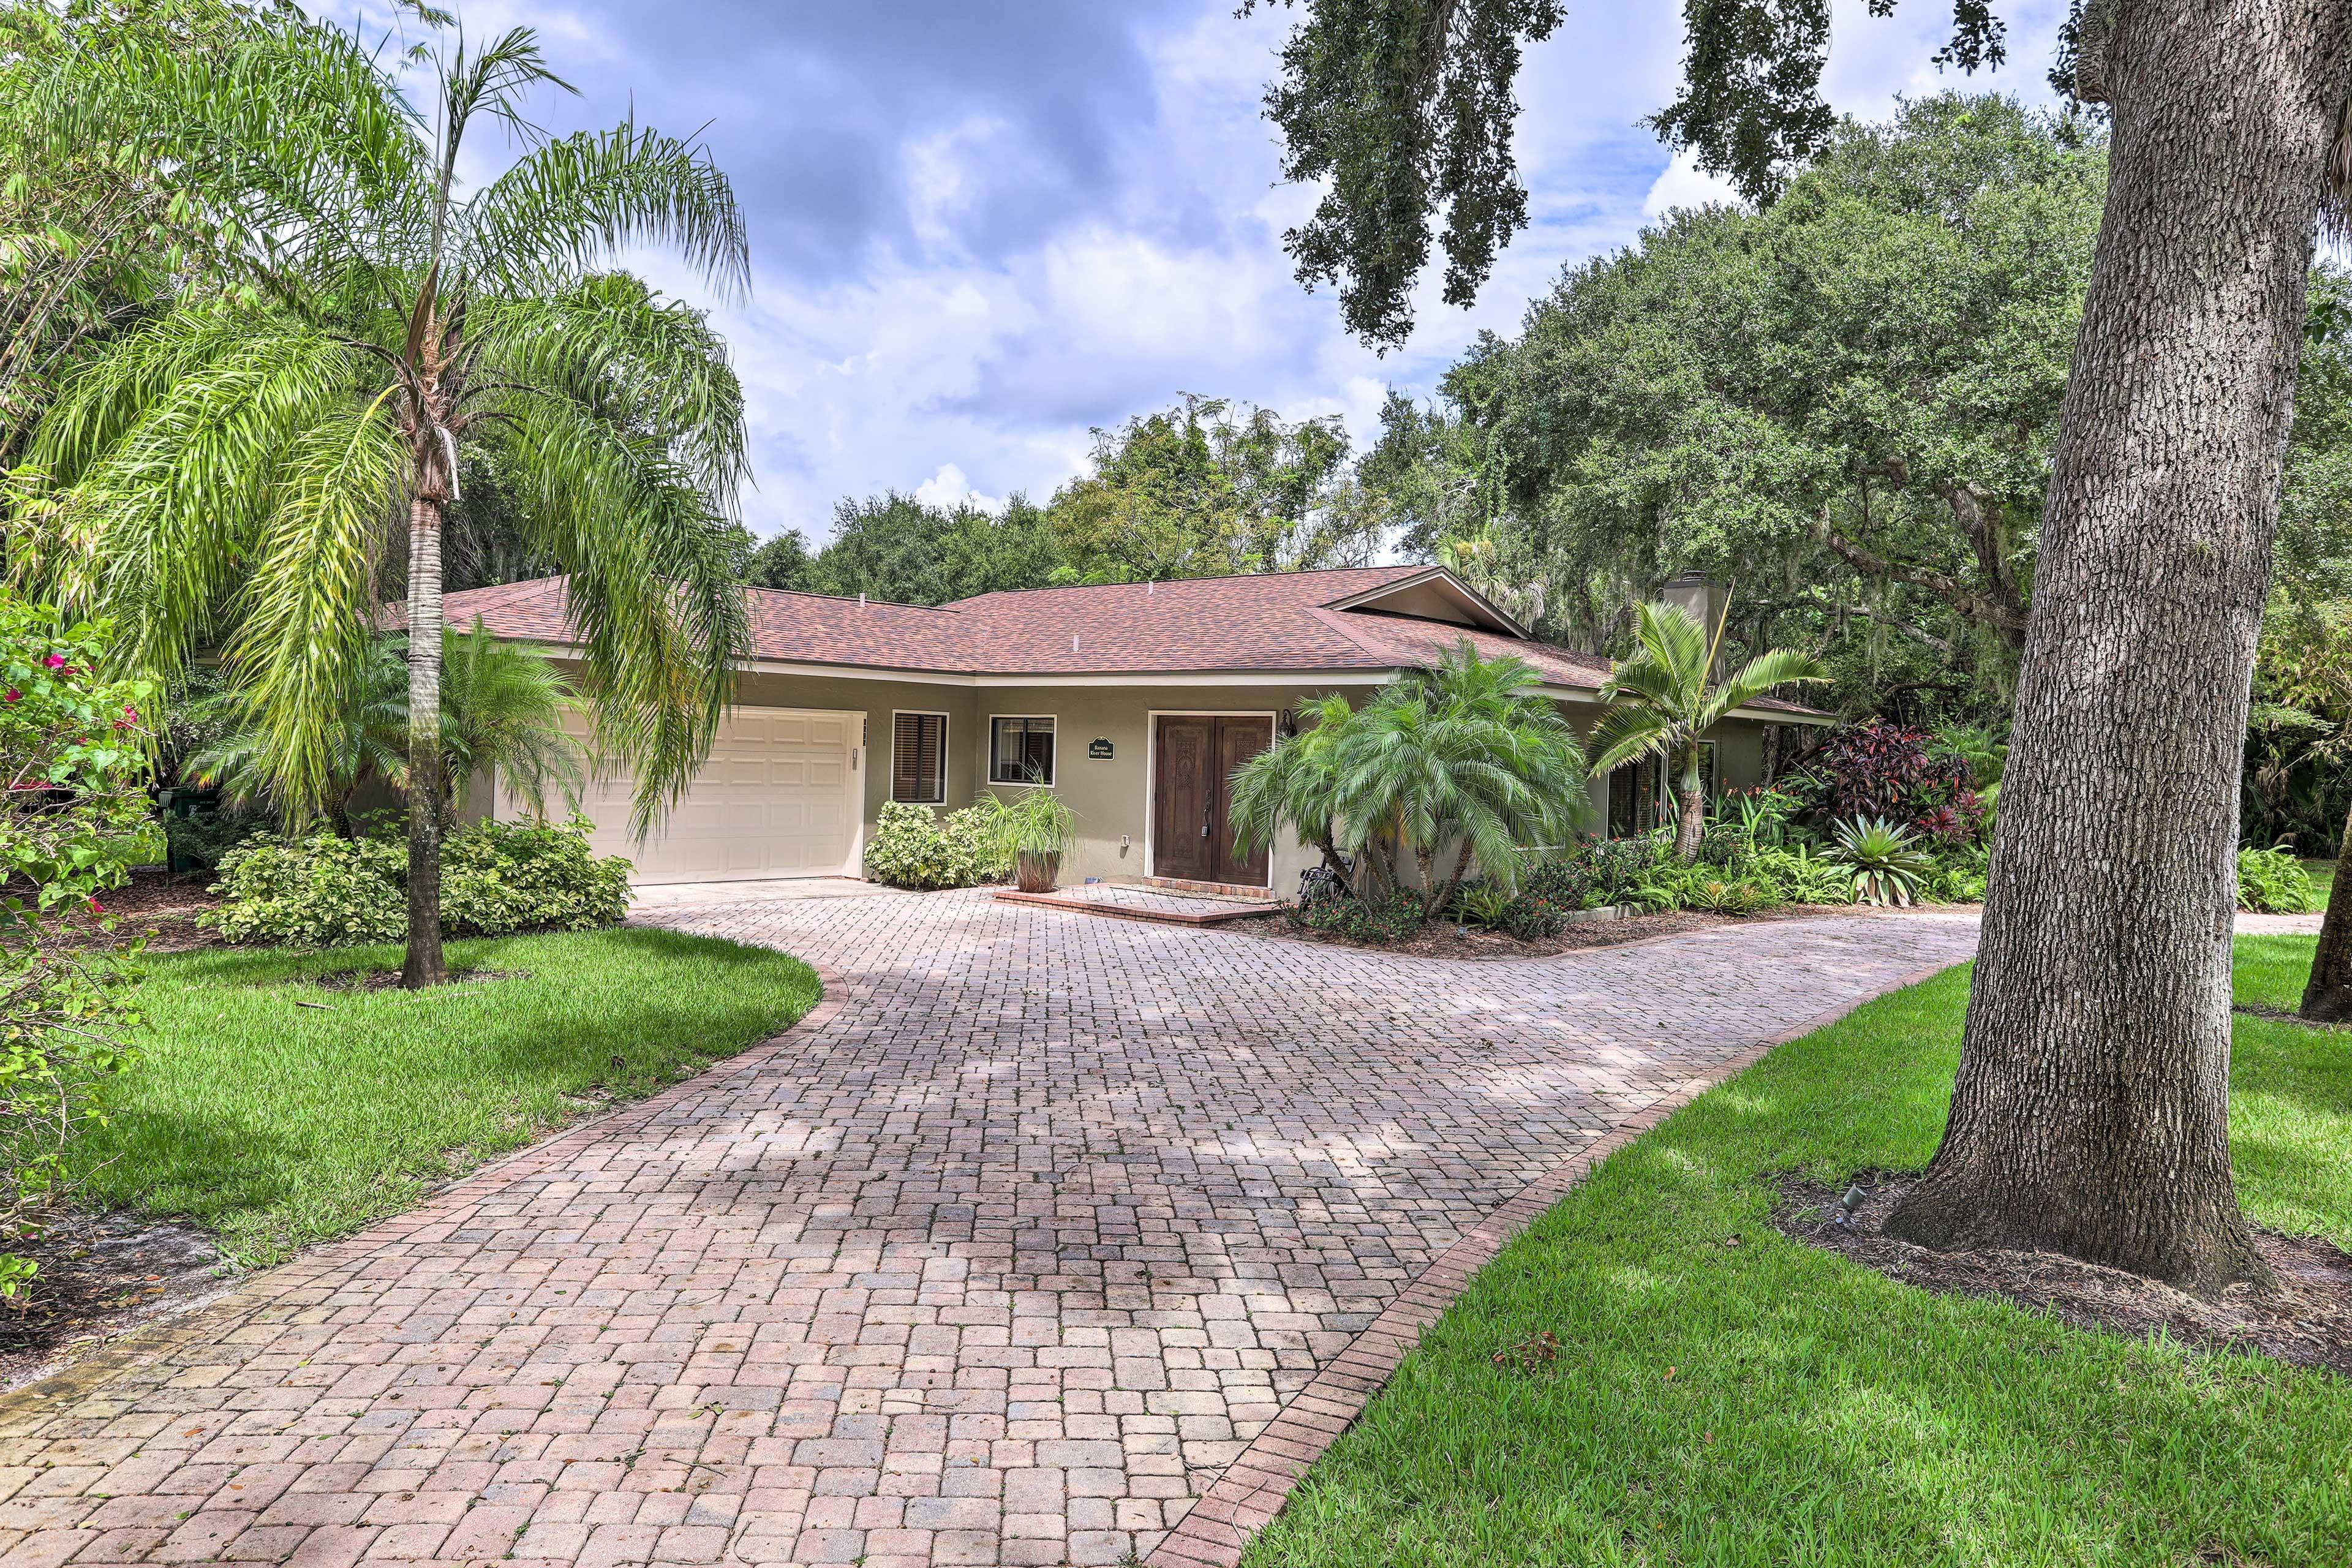 Make this Florida oasis your next getaway.